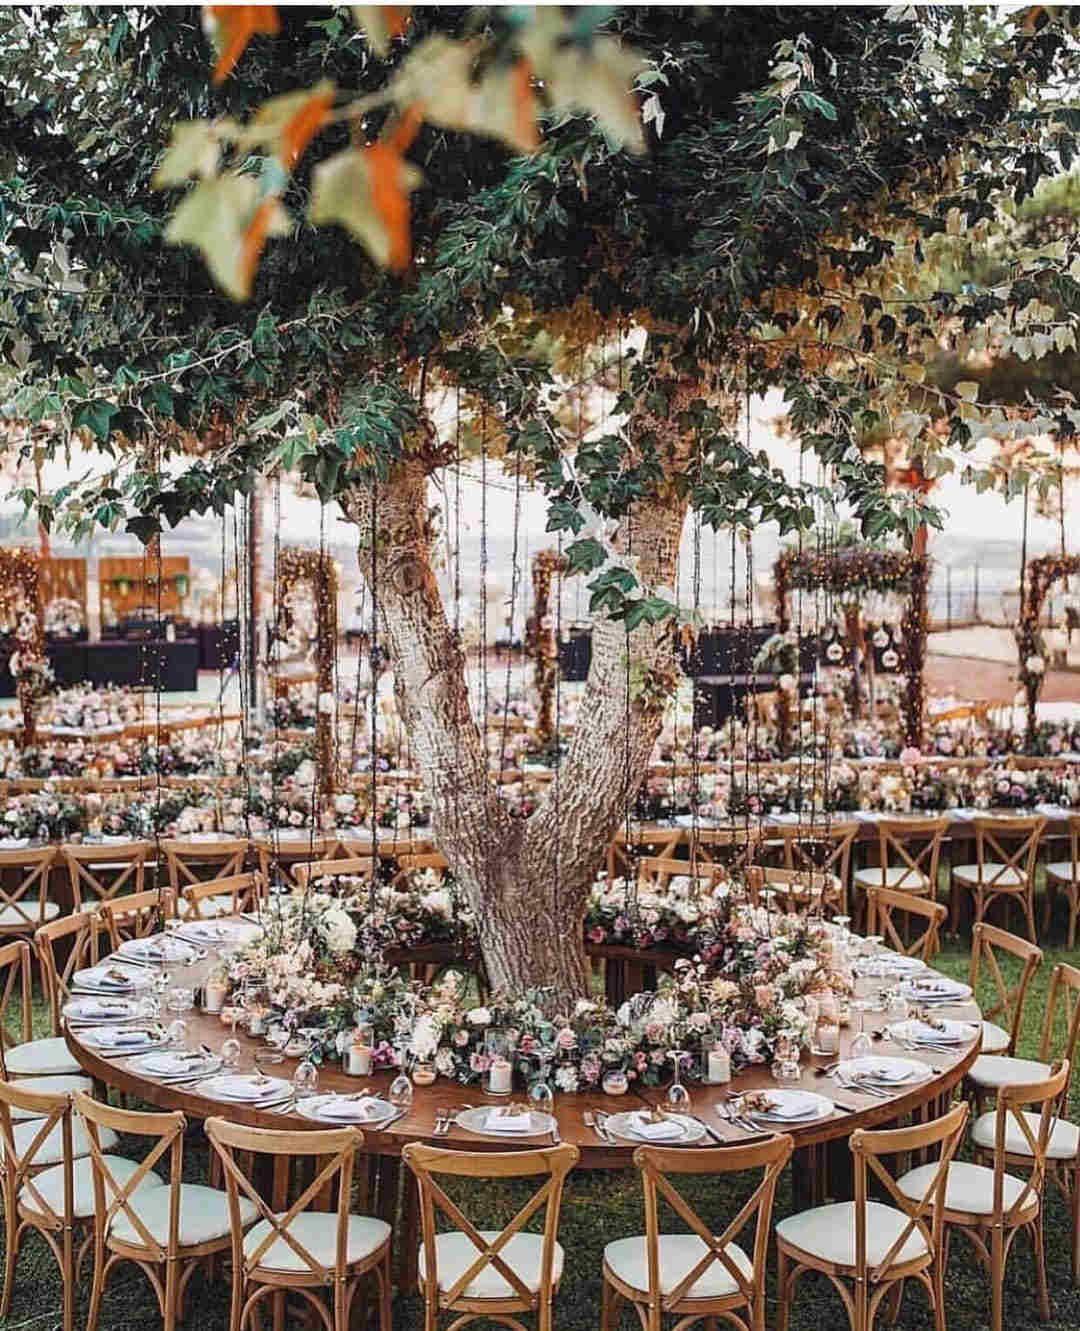 Vintage and elegant wedding decoration ideas: garden wedding; outdoor  wedding; weddi… | Wedding decor elegant, Outdoor wedding decorations,  Reception table settings